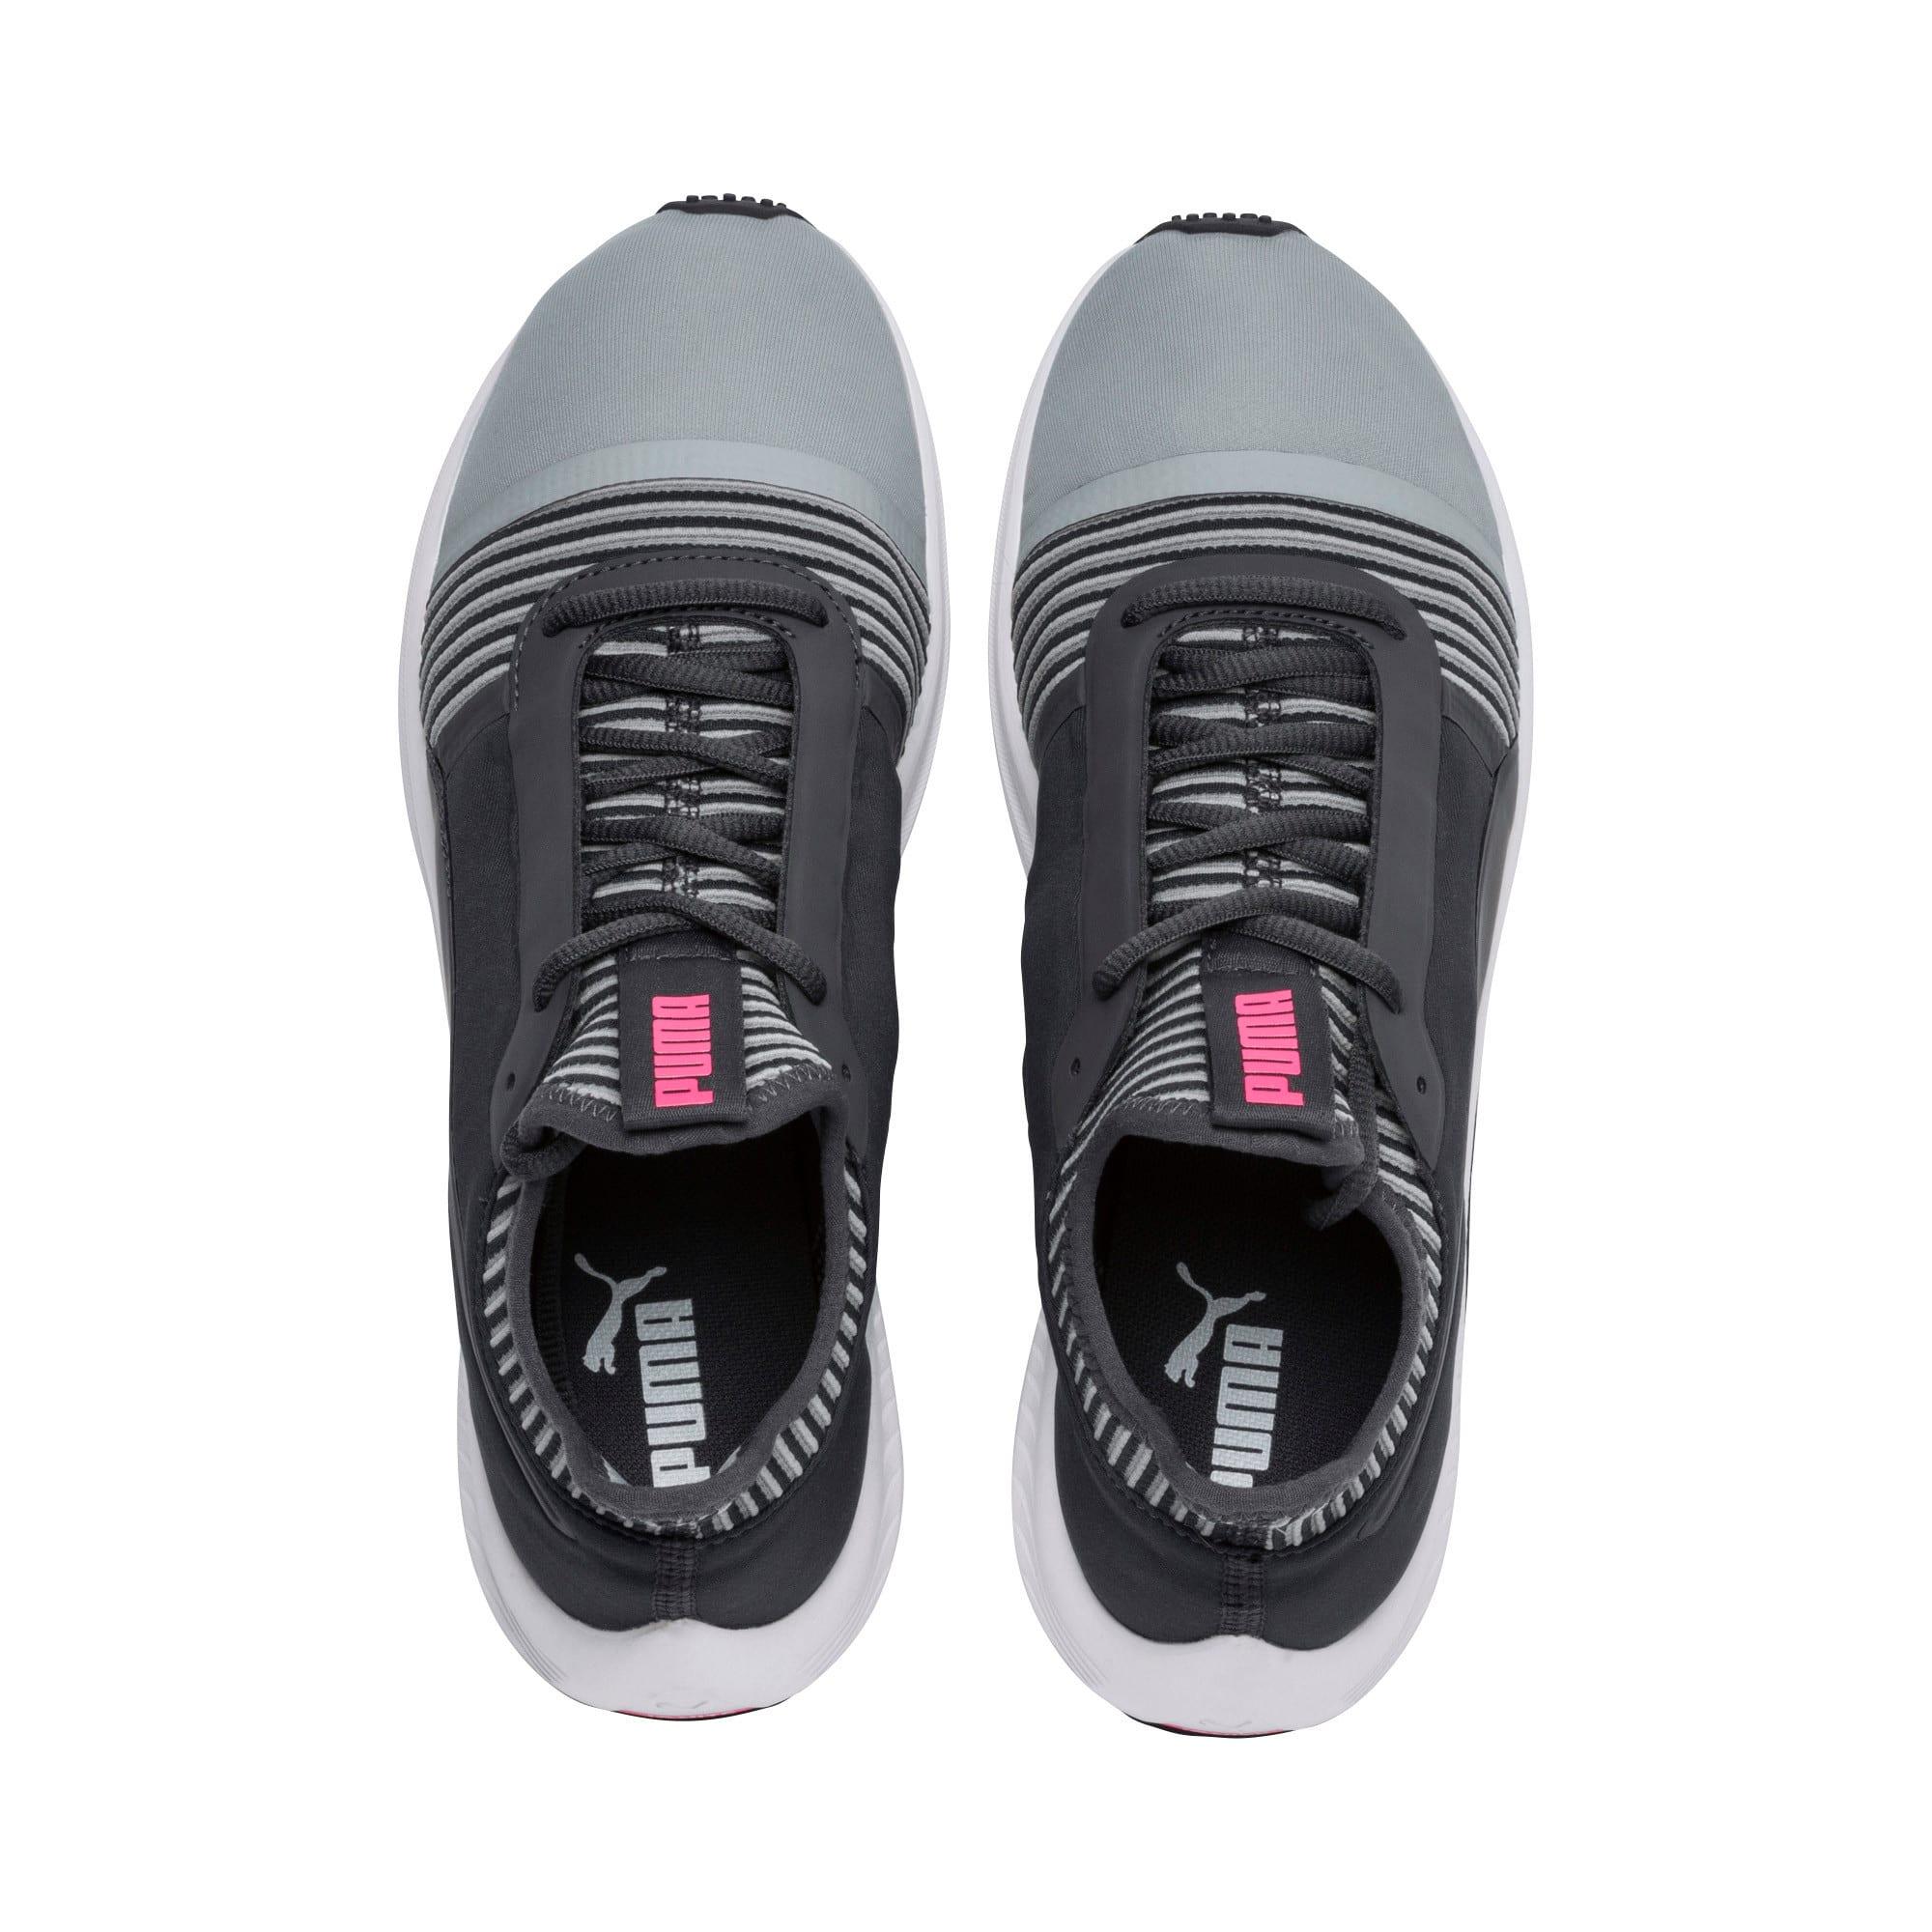 Thumbnail 6 of Amp XT Women's Training Shoes, Iron Gate-Quarry, medium